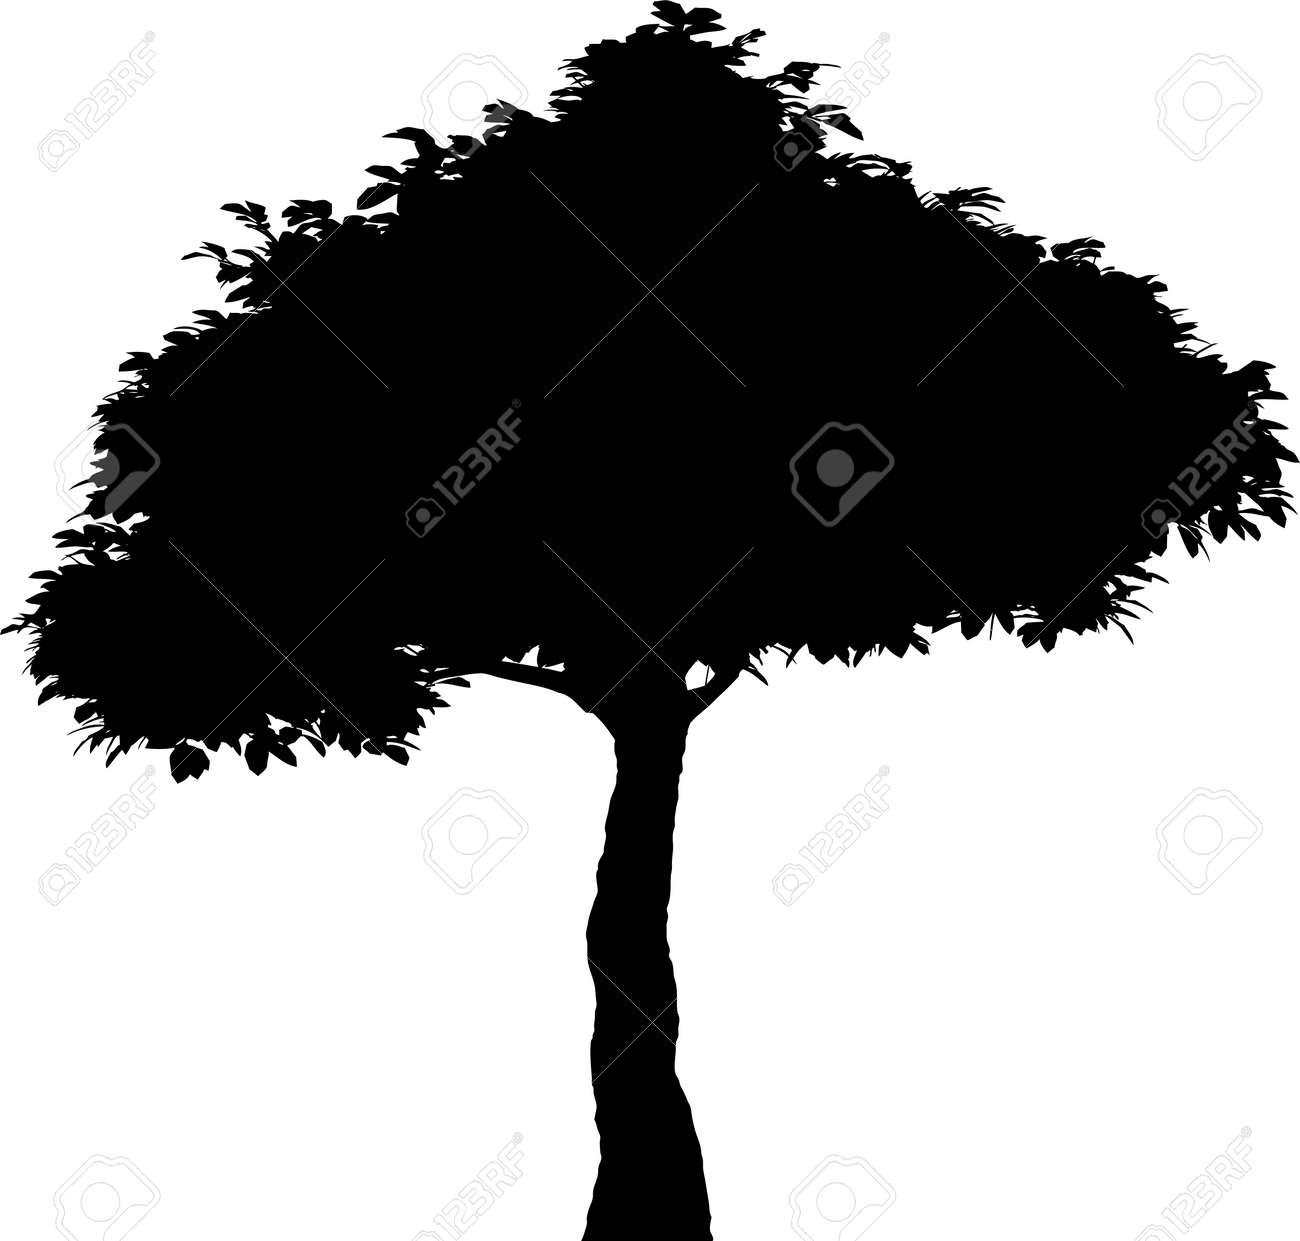 Tree Stock Vector - 7334225